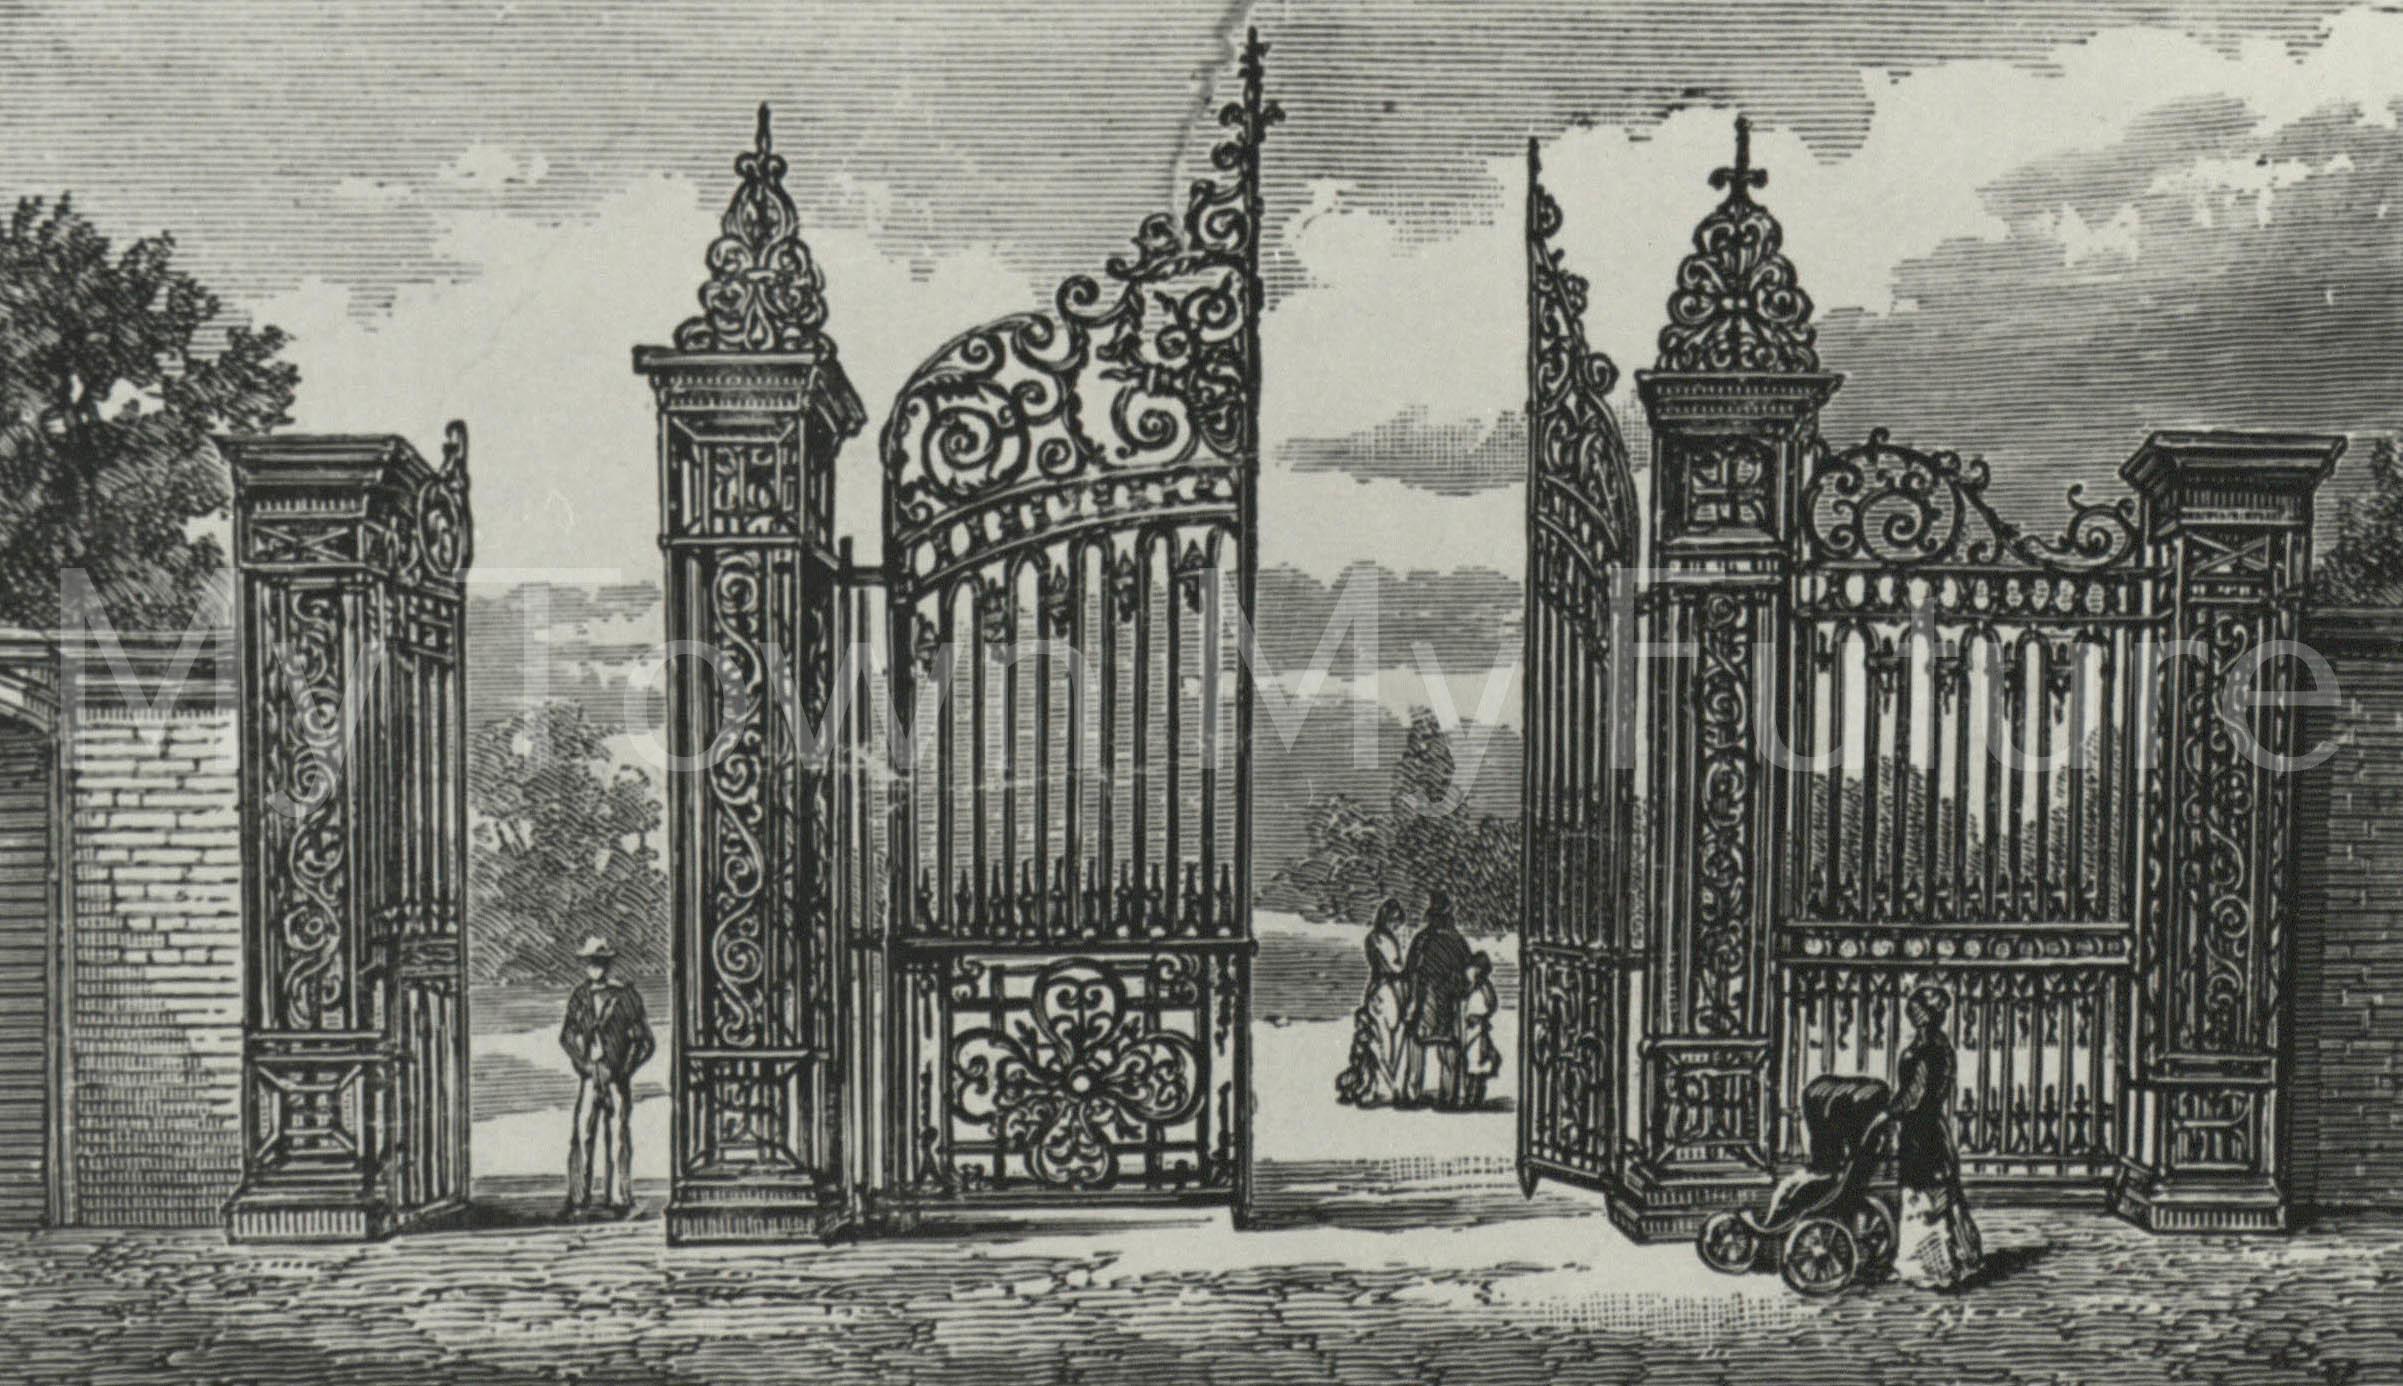 Albert Park Gates